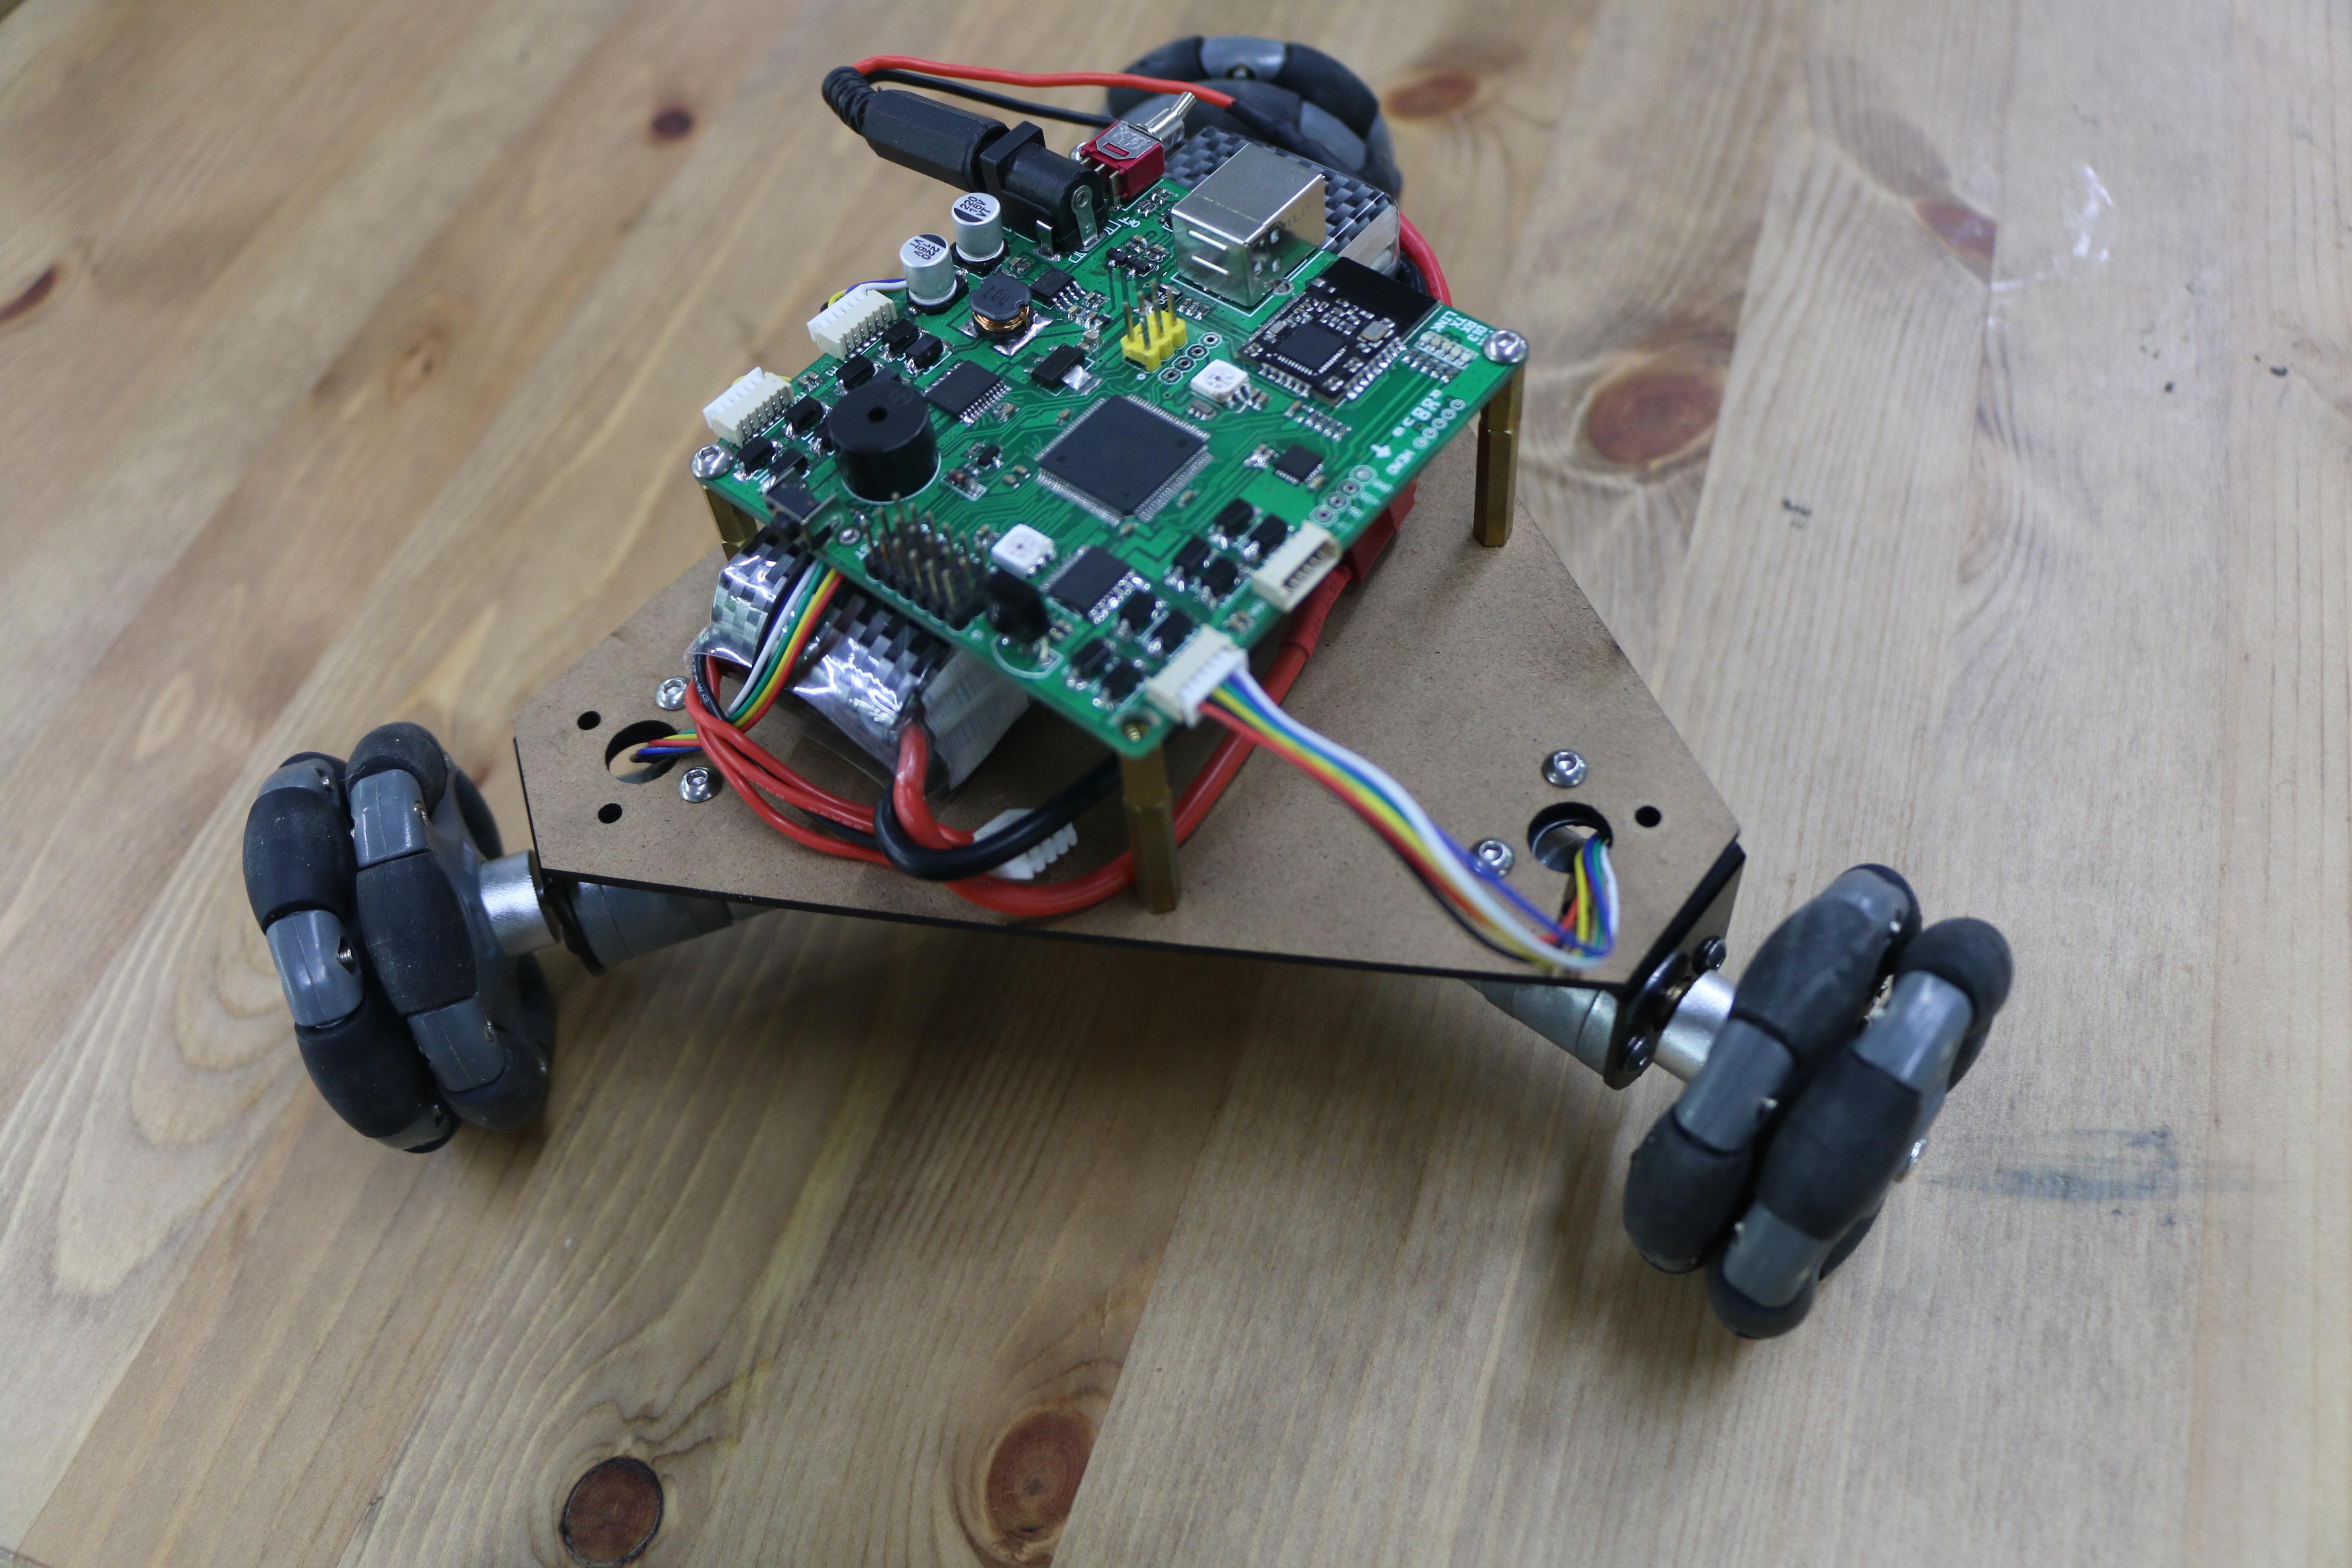 How to make an Auto-Omni vehicle